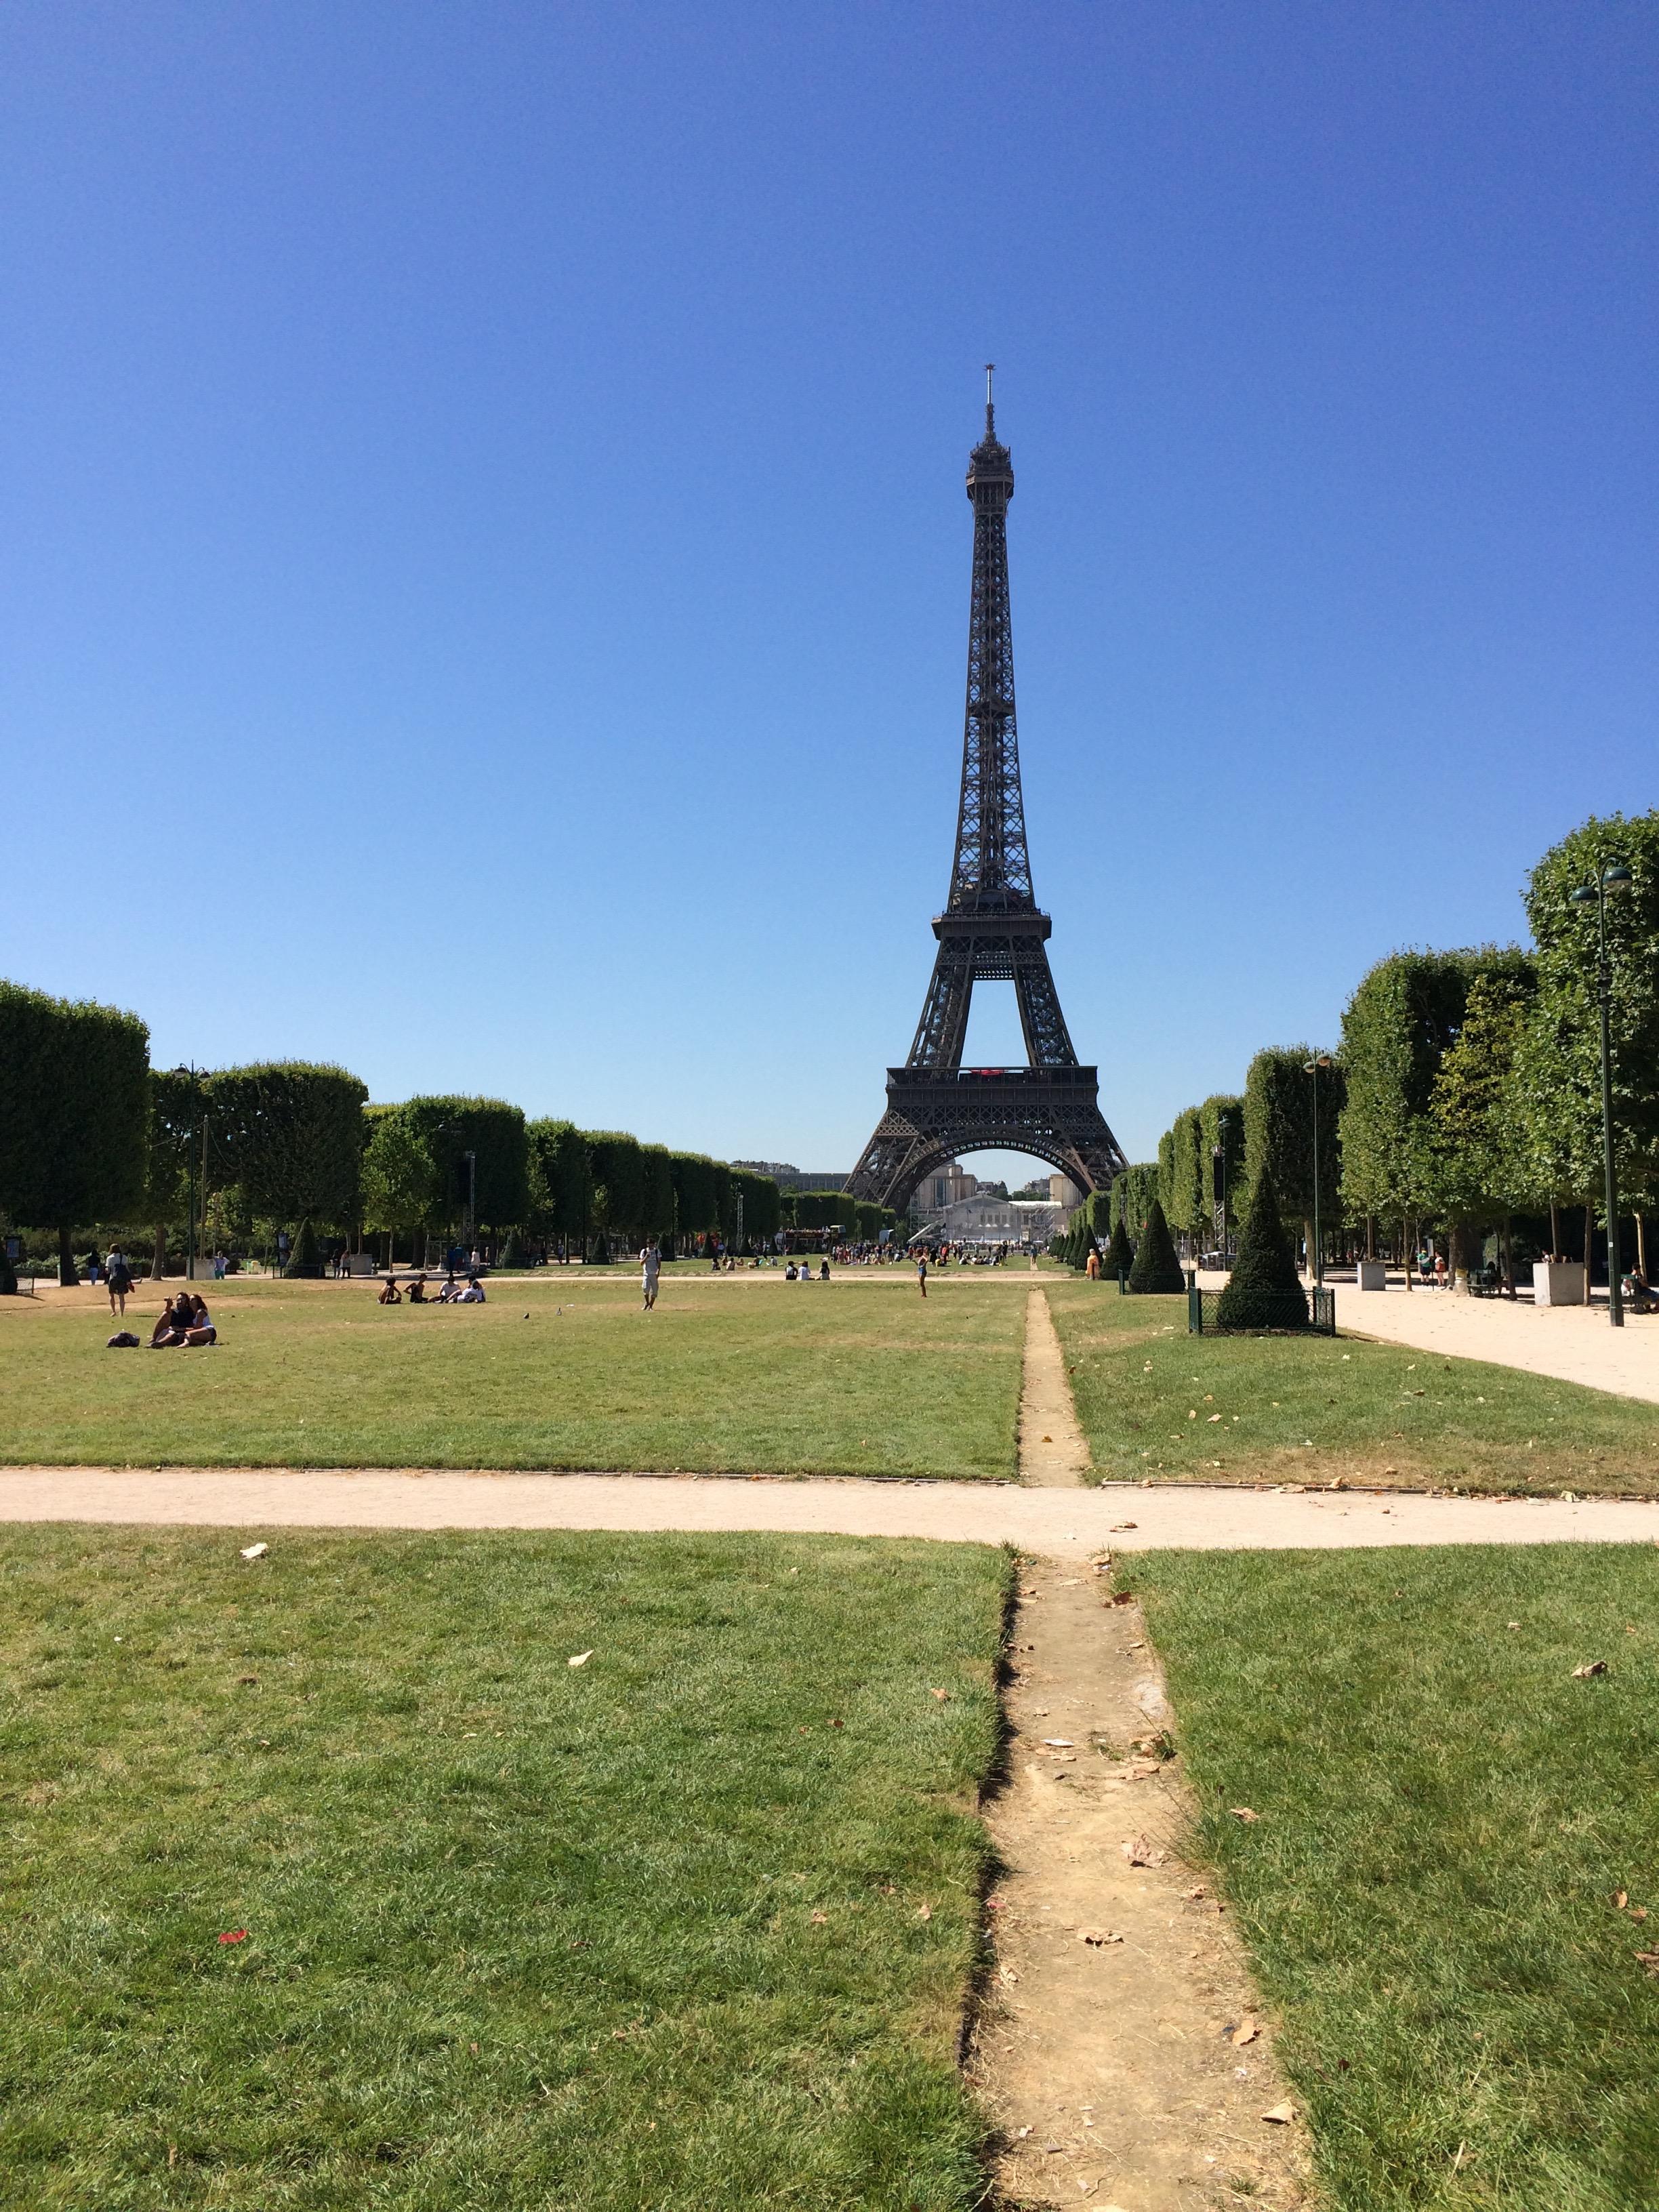 Tour Eiffel view from Champ-de-Mars